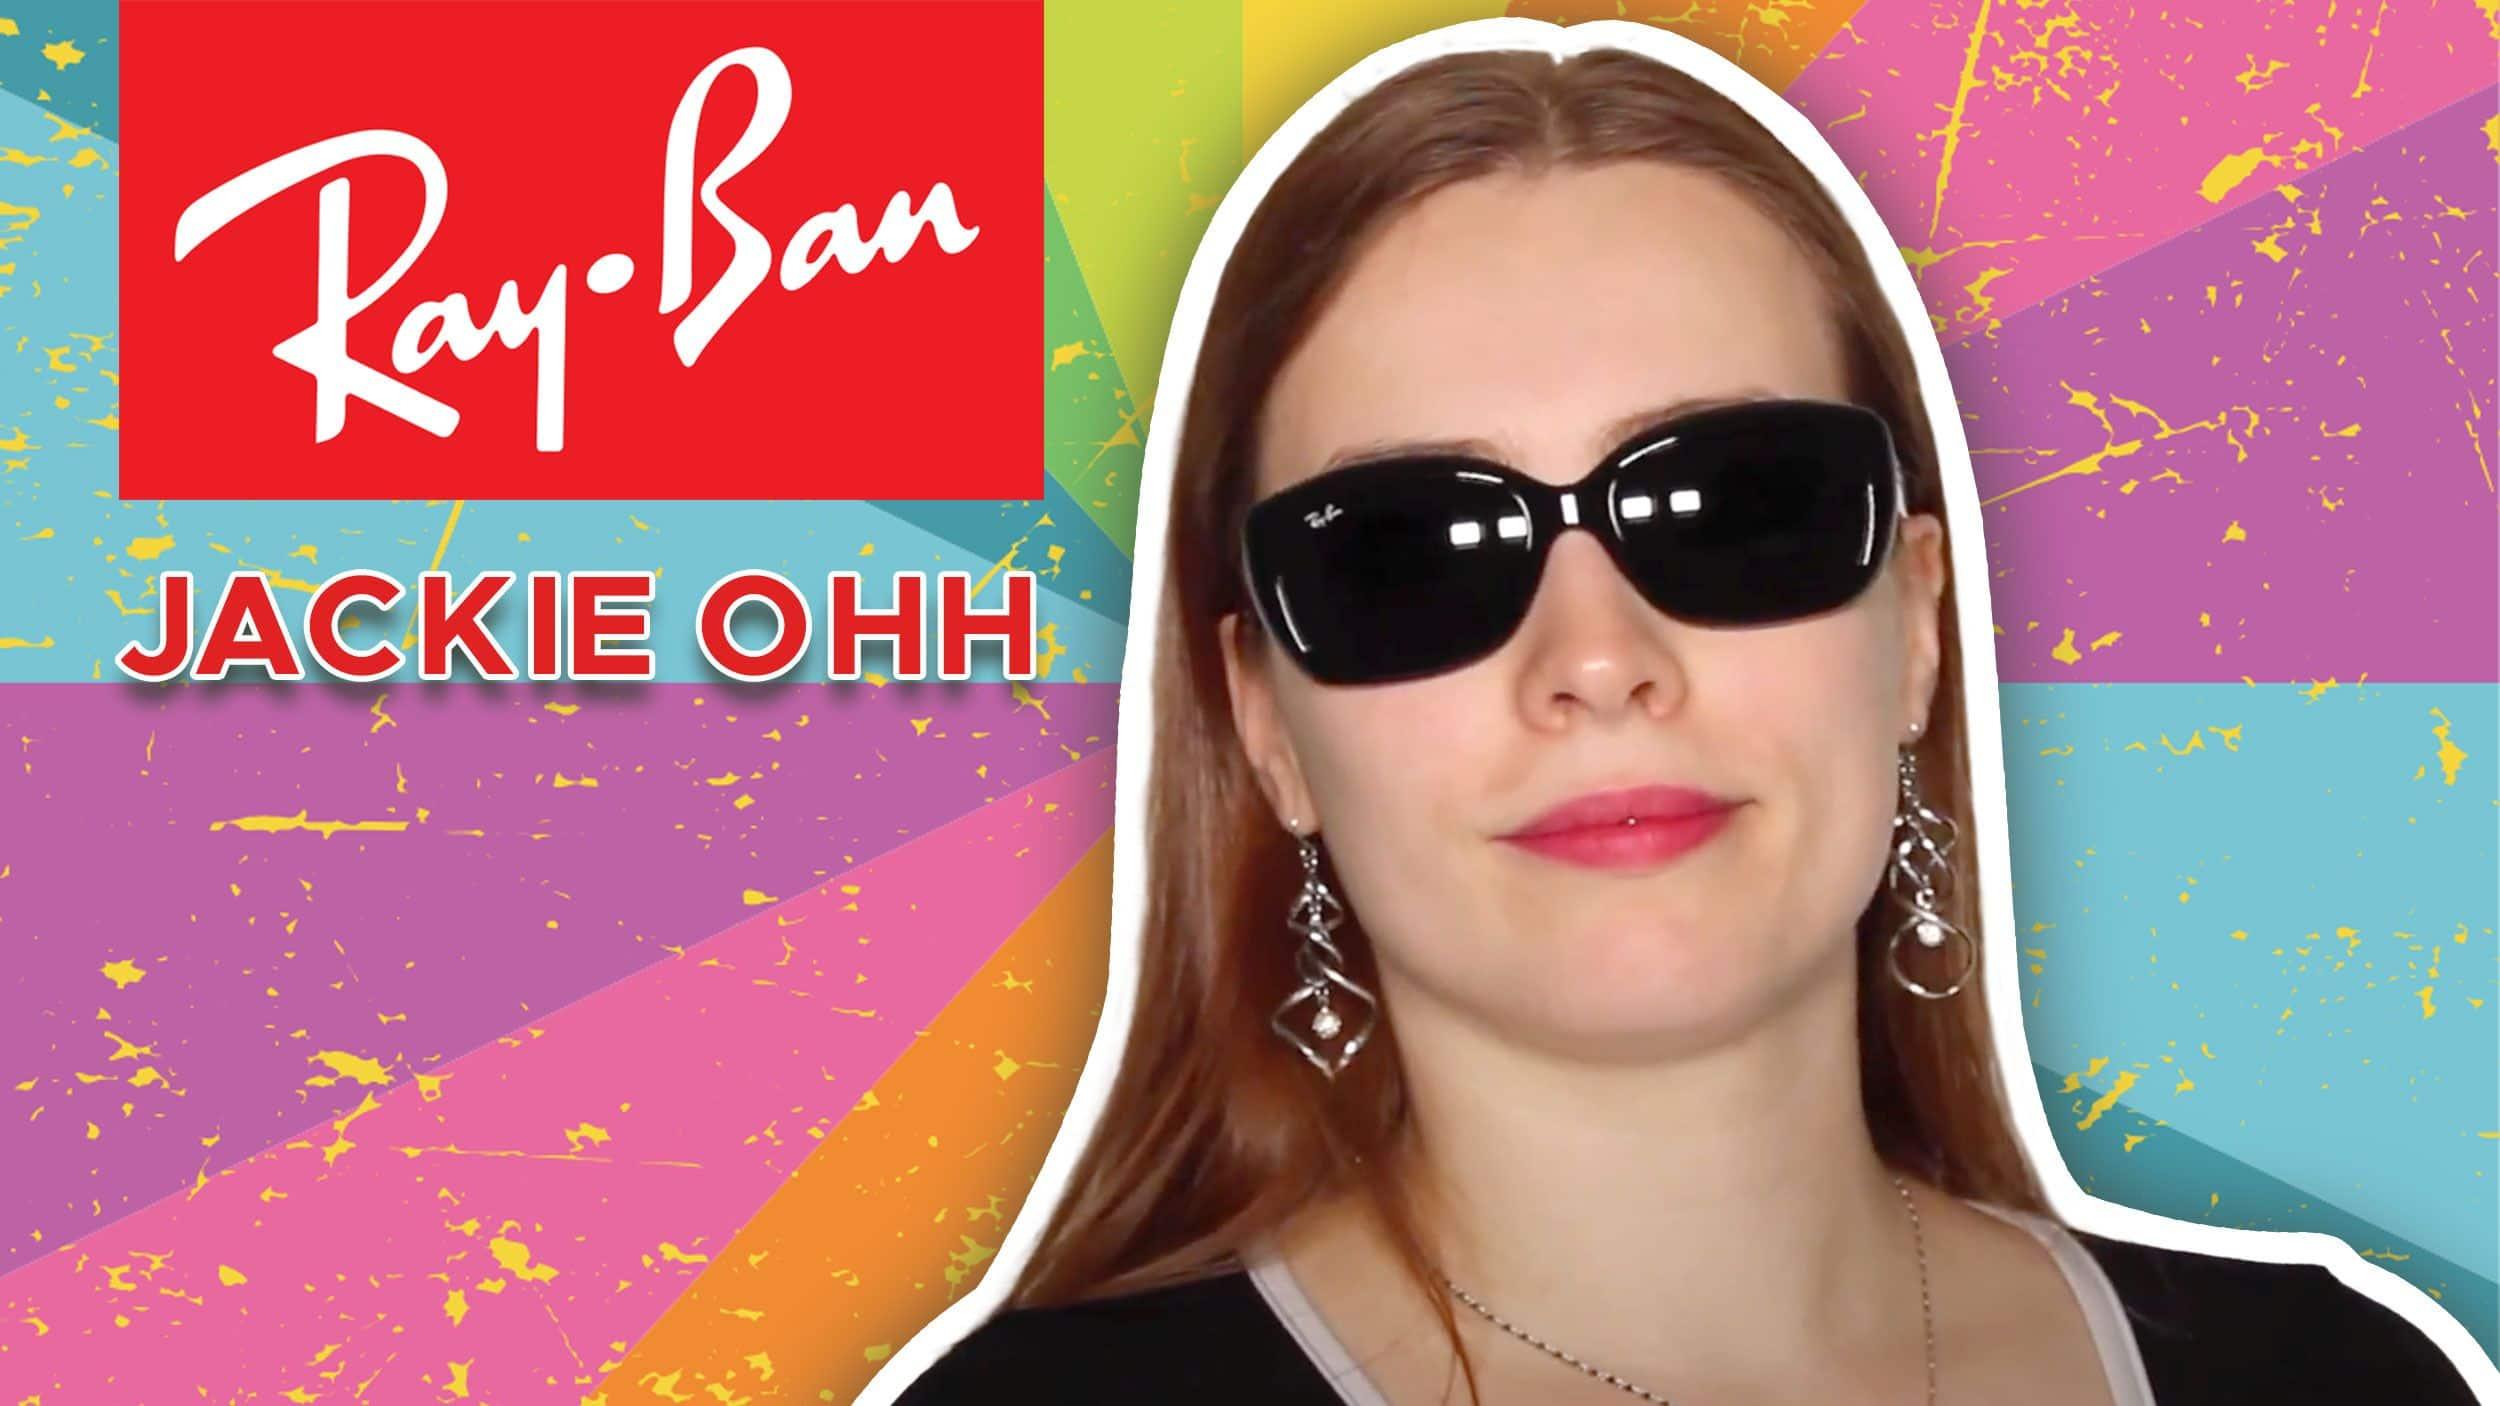 Ray Ban Jackie Ohh Sunglasses Header